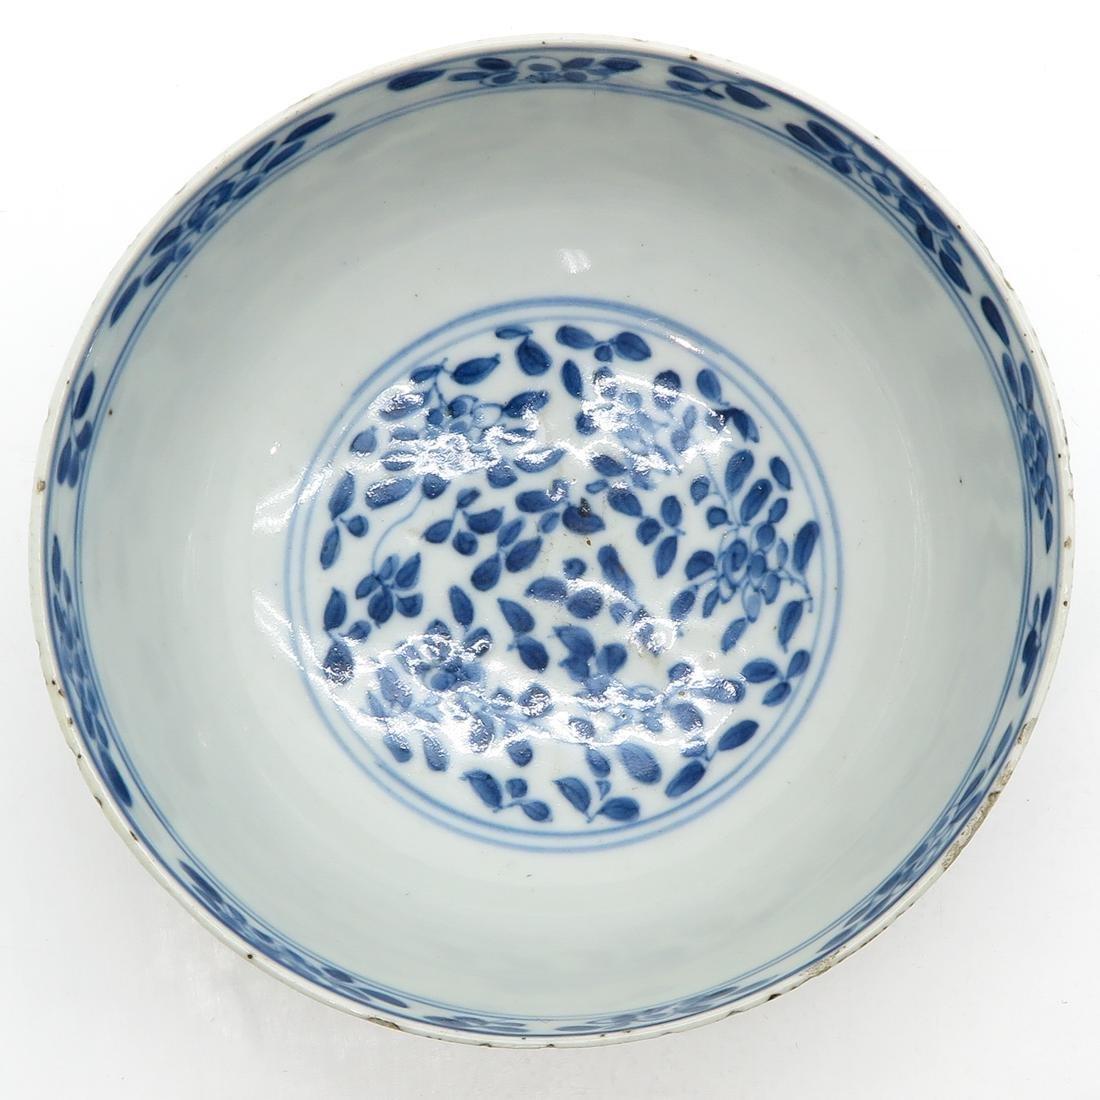 Bowl - 5